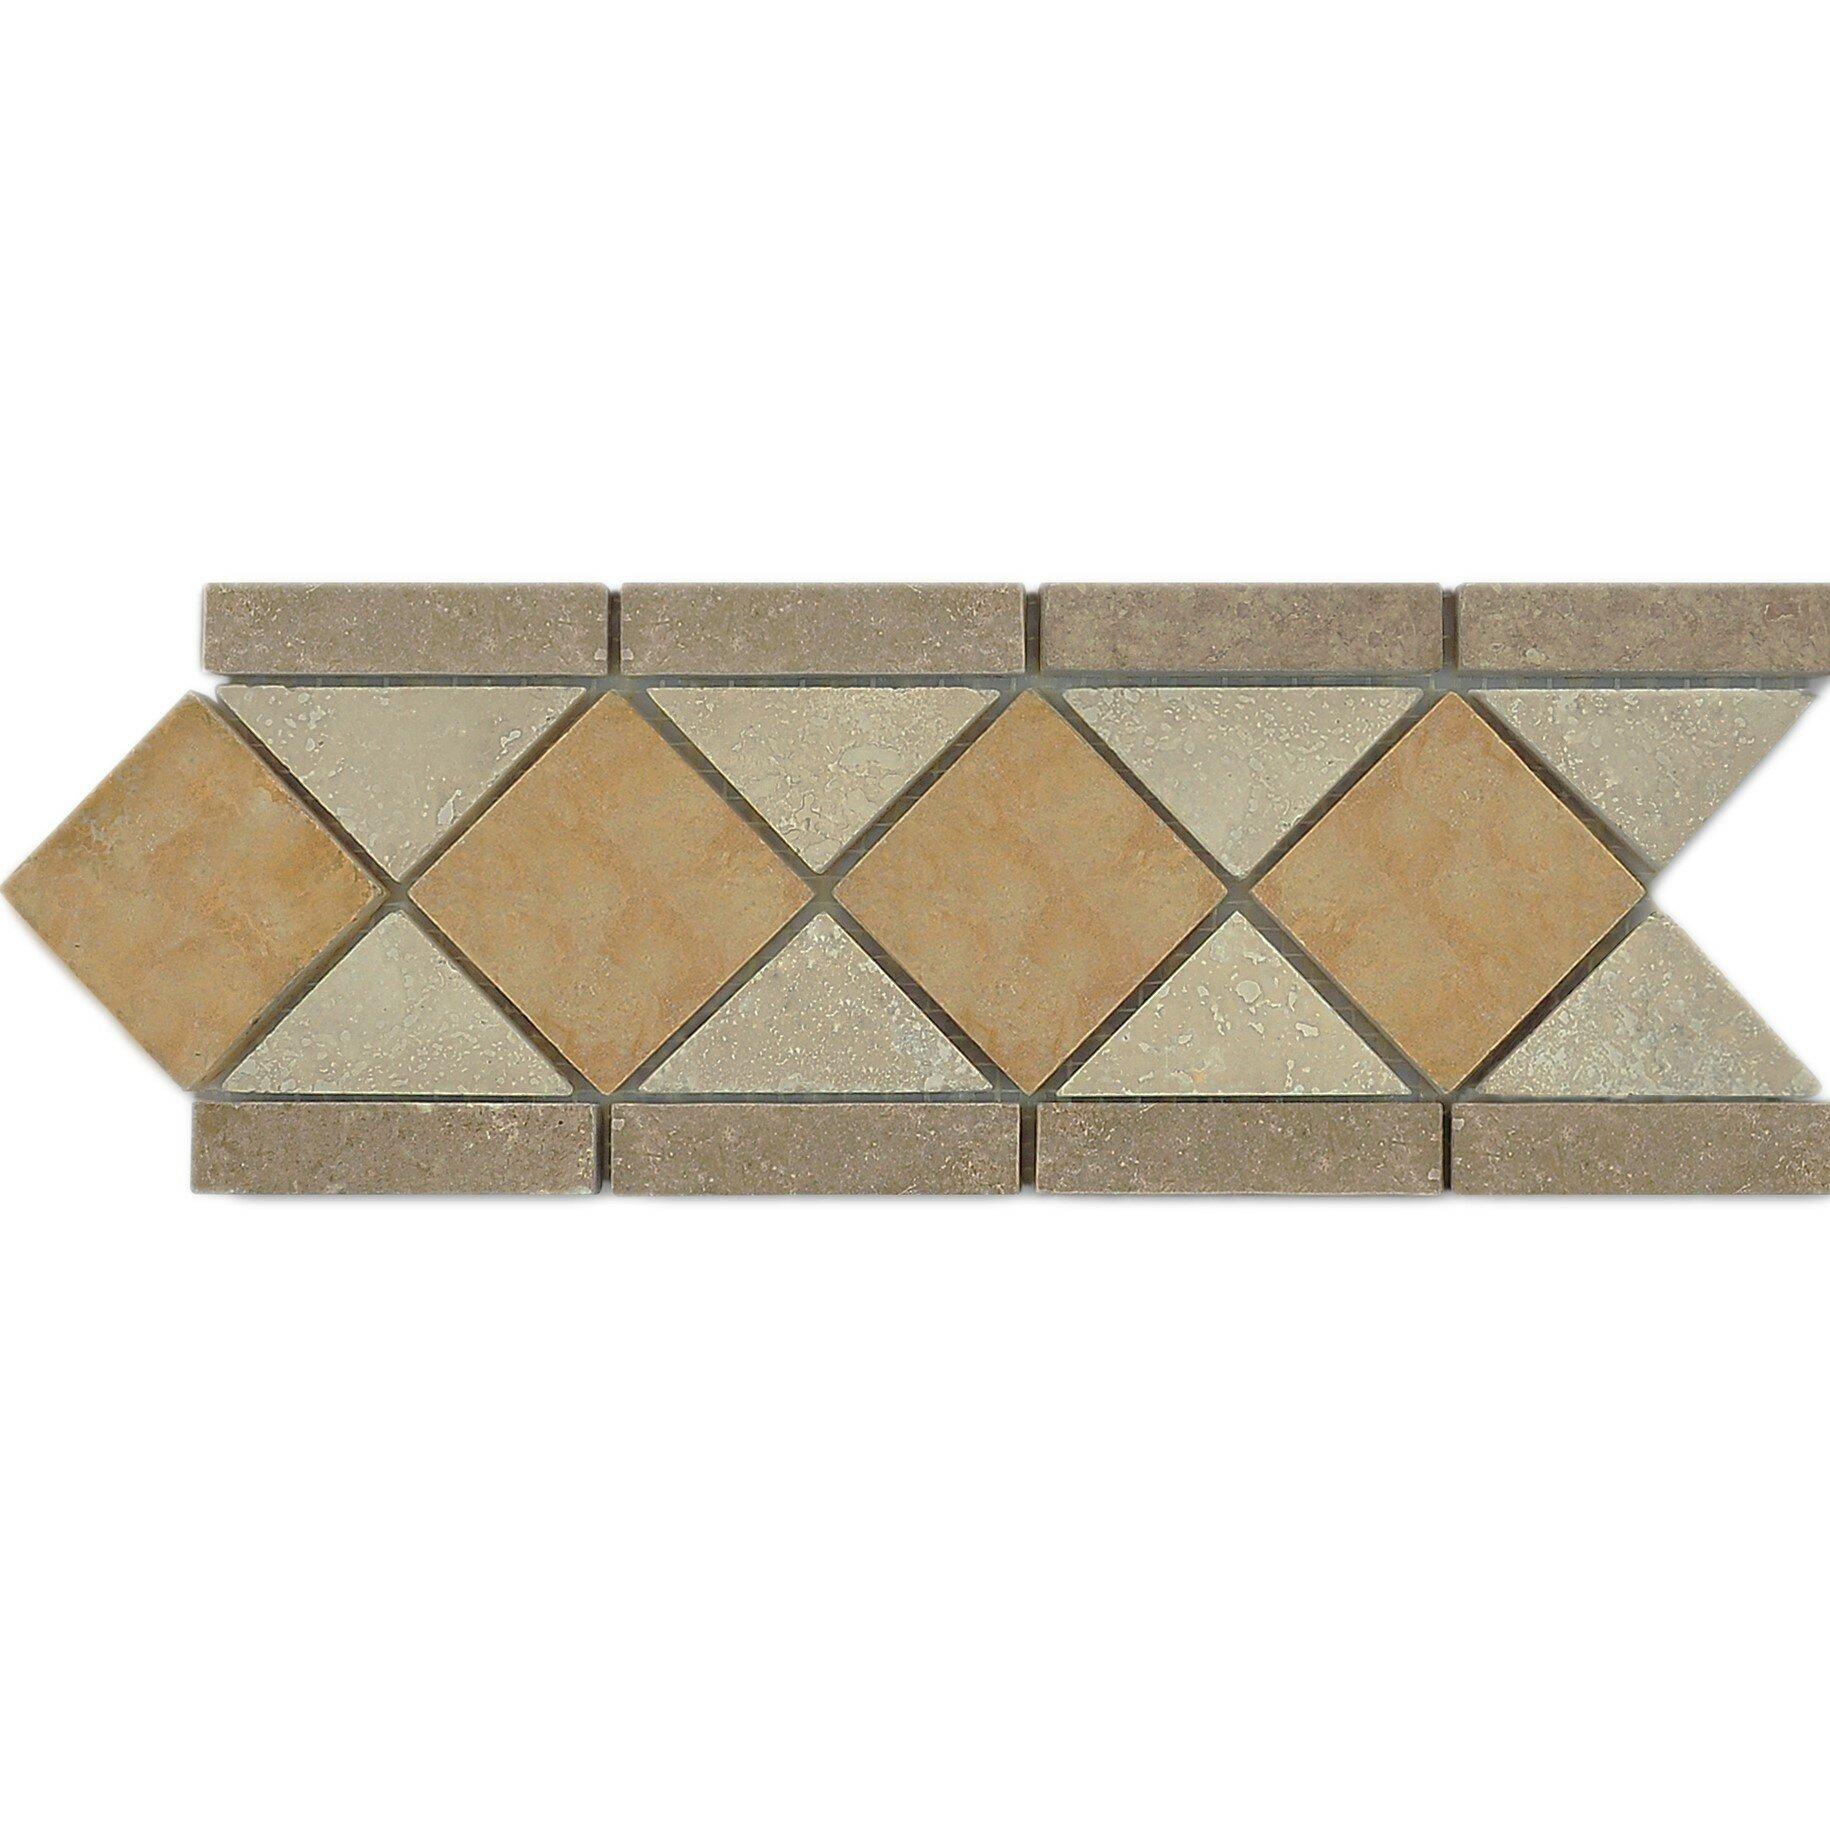 Travertine Noce Chiaro Border Tile